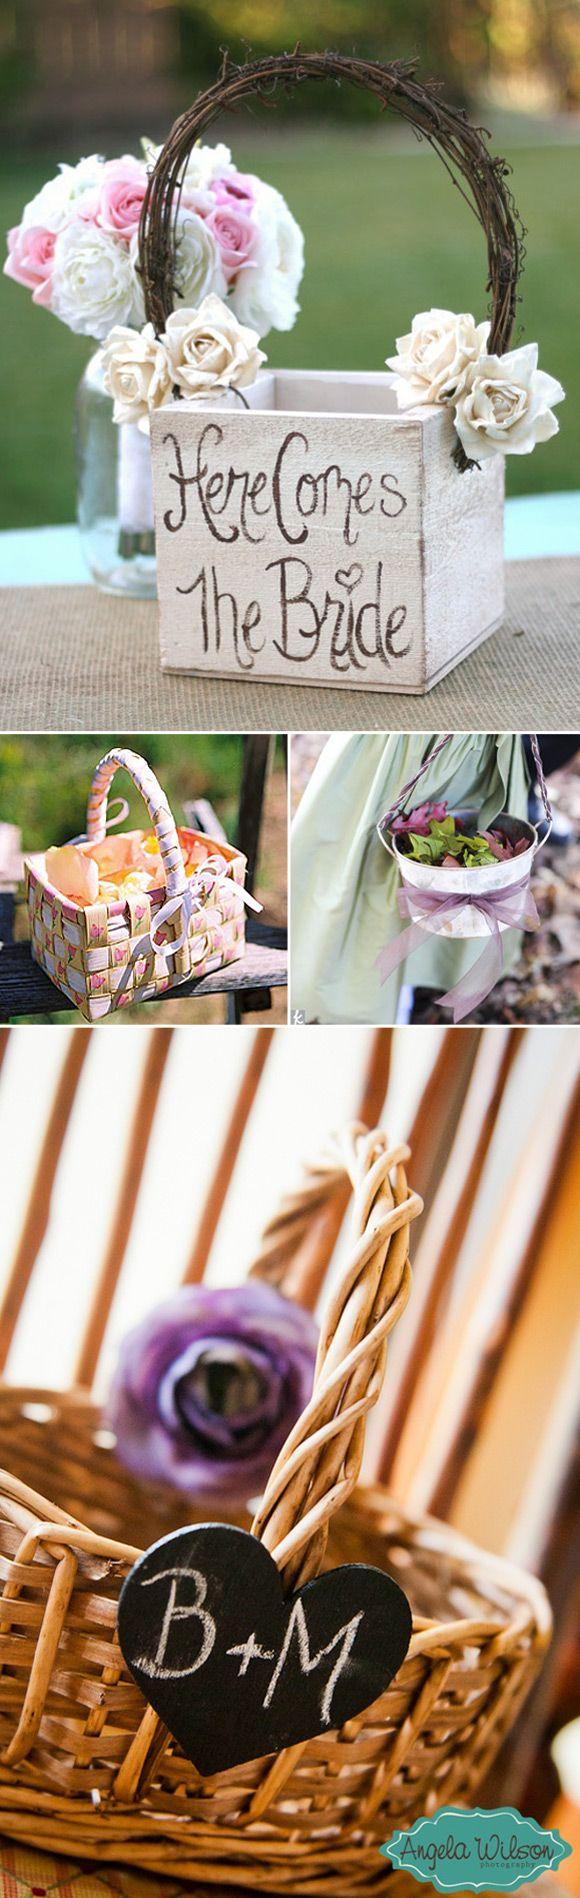 Decoraci n de cestas para bodas ideas para decorar las for Decoracion de cestas